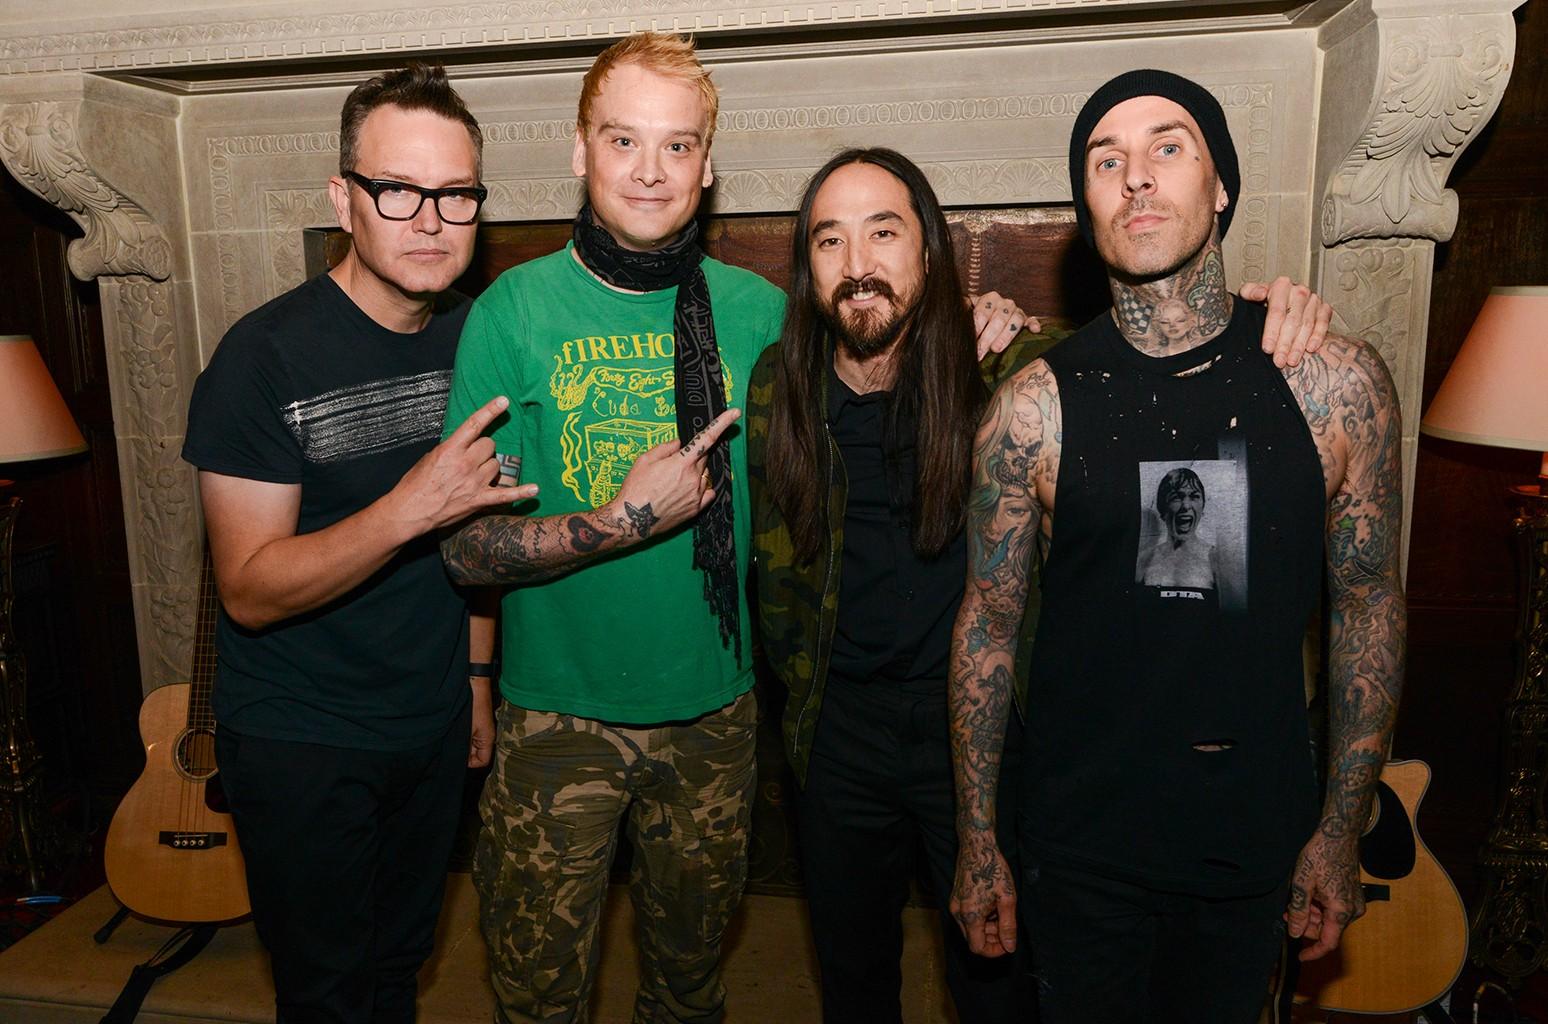 Steve Aoki and Blink 182